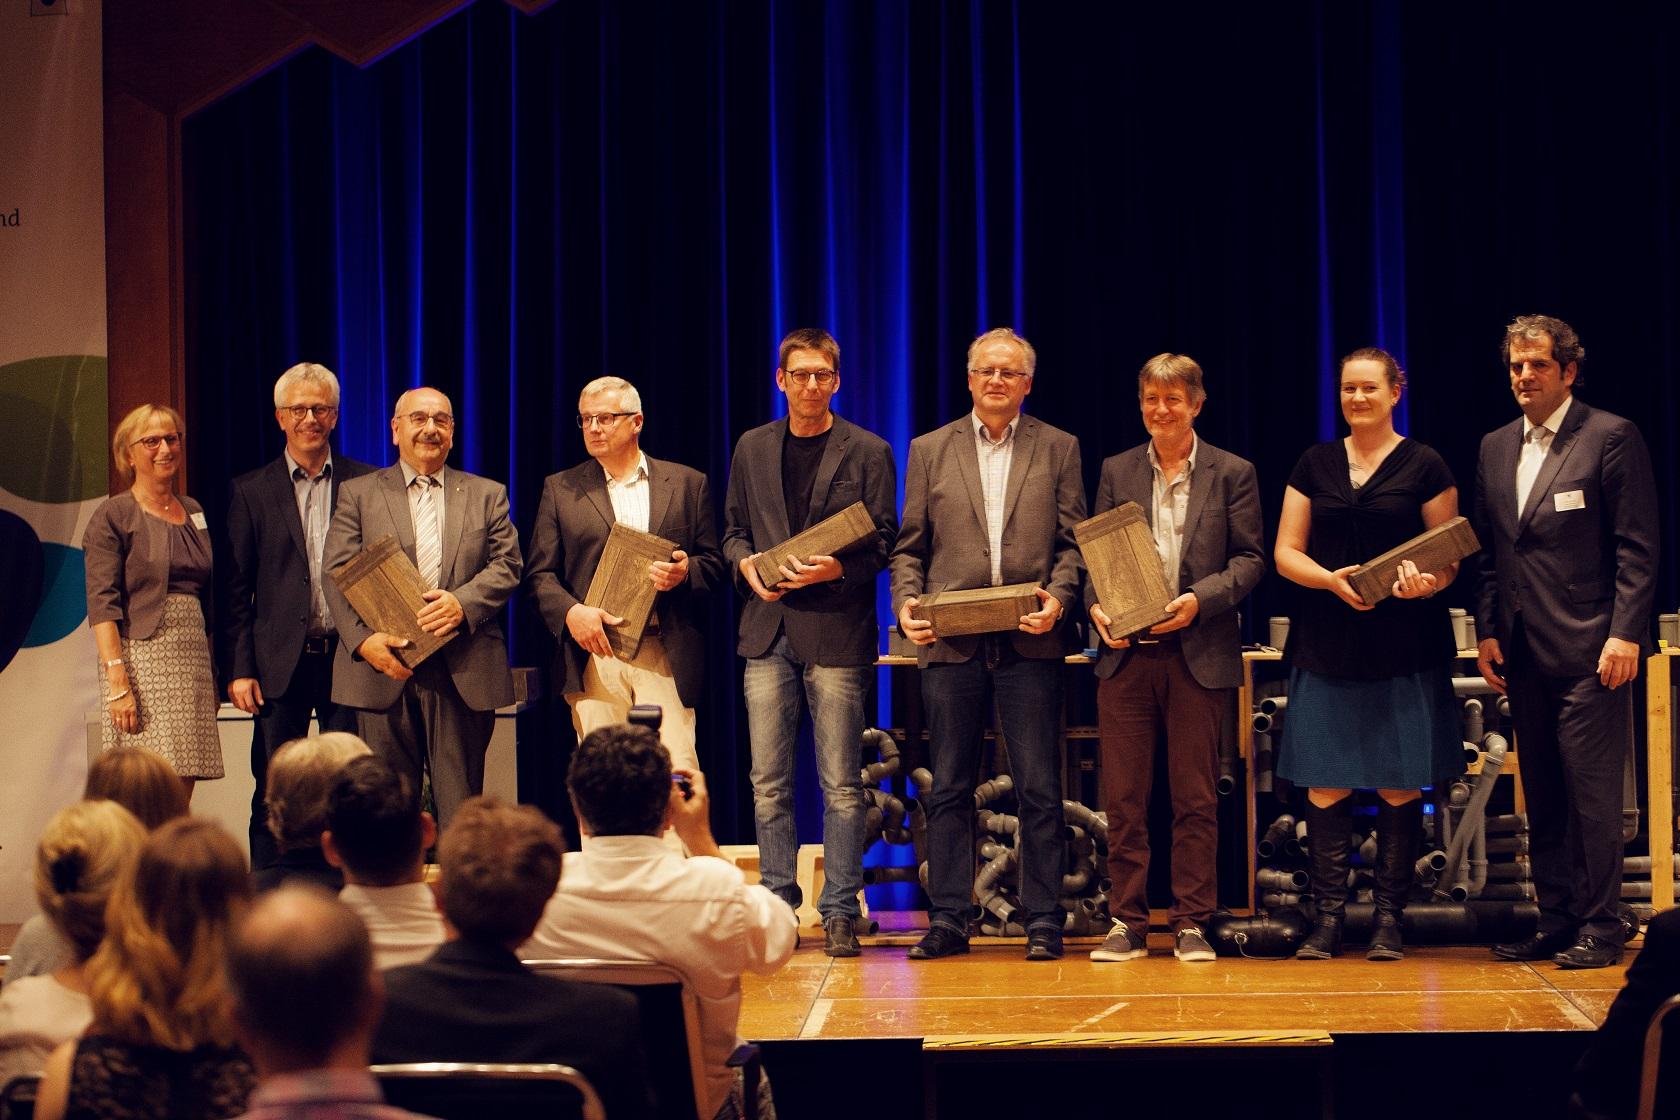 Freisprechungsfeier Bruchsal 2017 Vertreter der Berufsschule